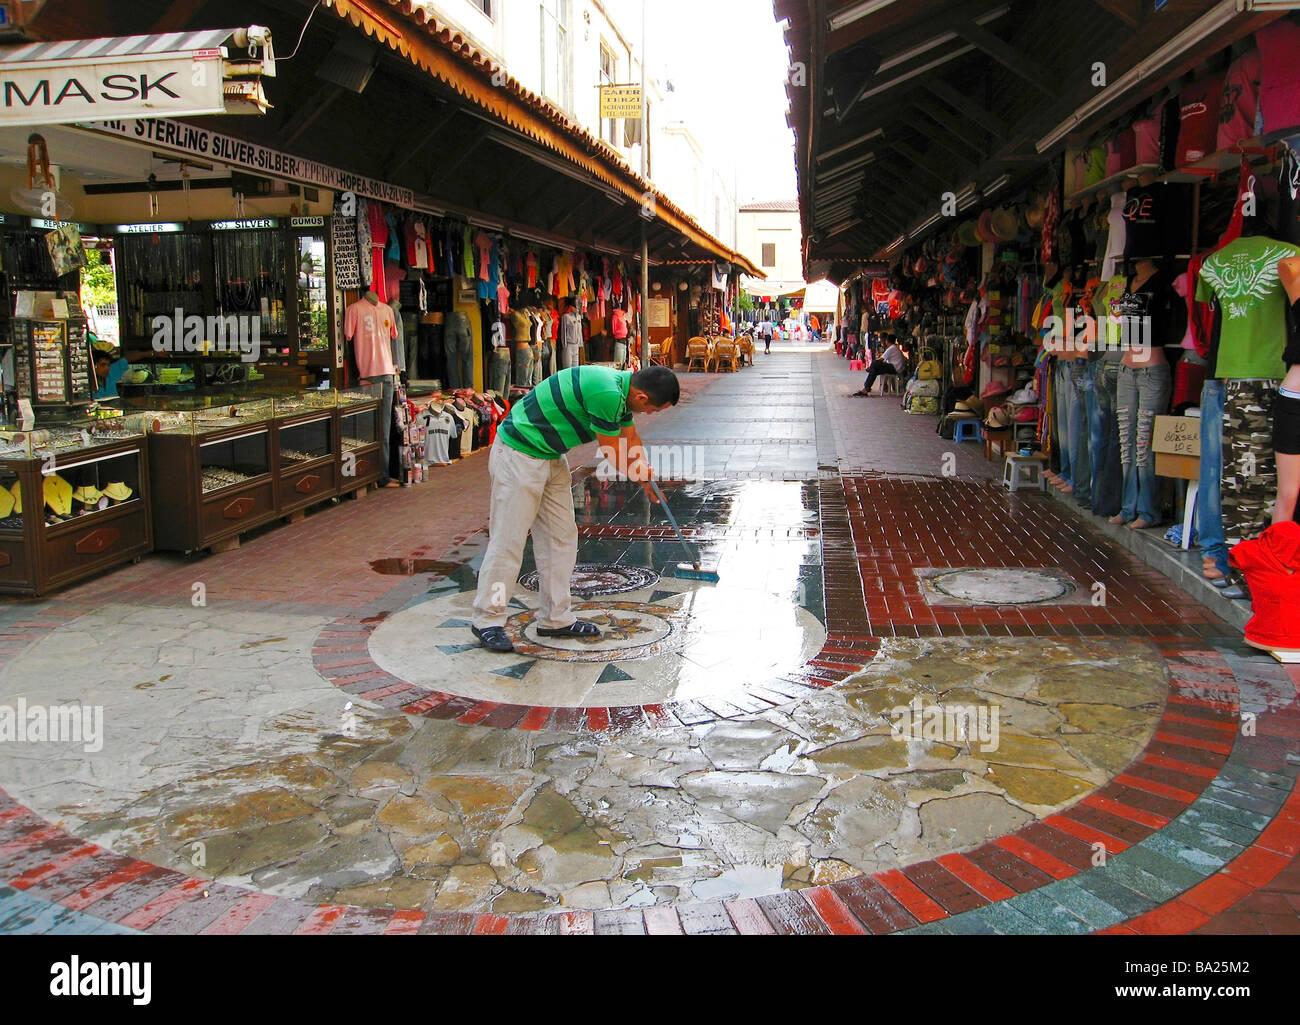 Man cleaning street bazaar in Alanya Turkey - Stock Image